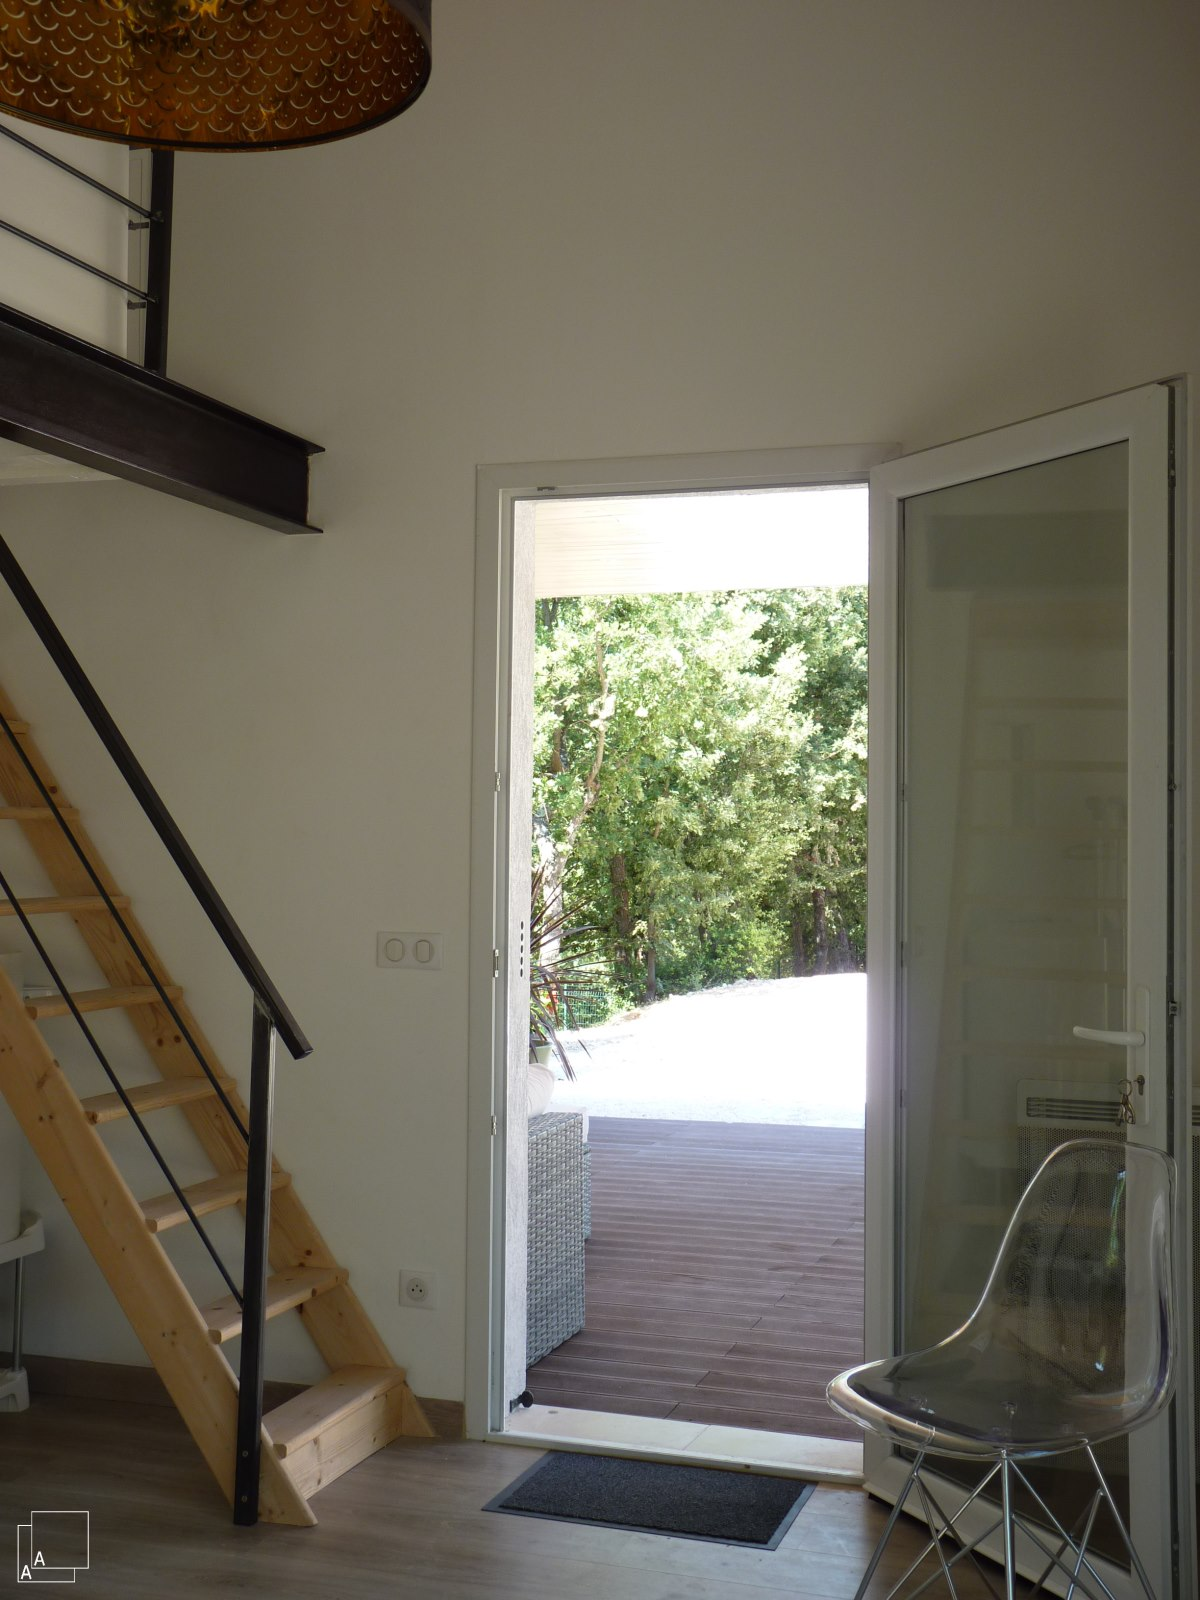 mezzanine-dependance-ete-salon-amis-jeremy-azzaro-architecte